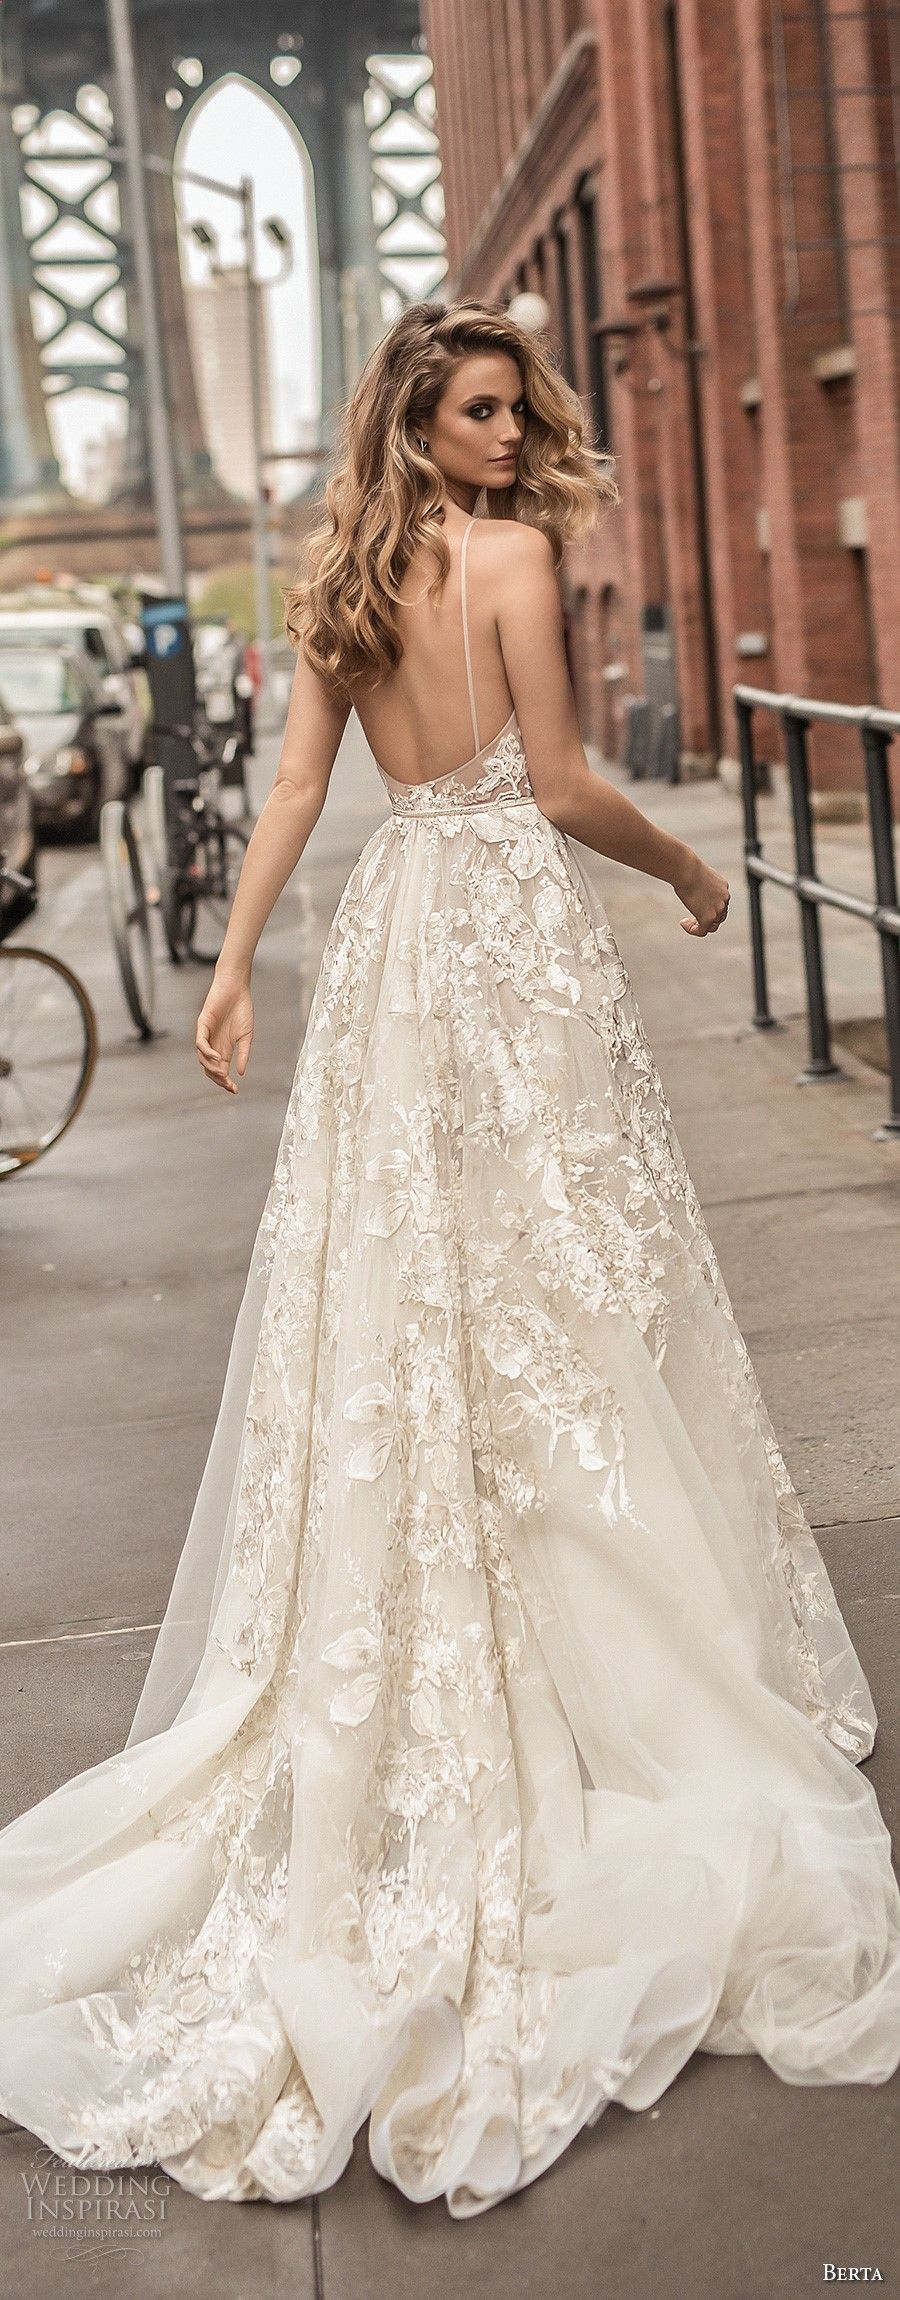 0c6c9cab974 berta spring 2018 bridal spaghetti strap deep plunging v neck full  embellishment sexy romantic a line wedding dress open back chapel train (1)  bv -- Berta ...